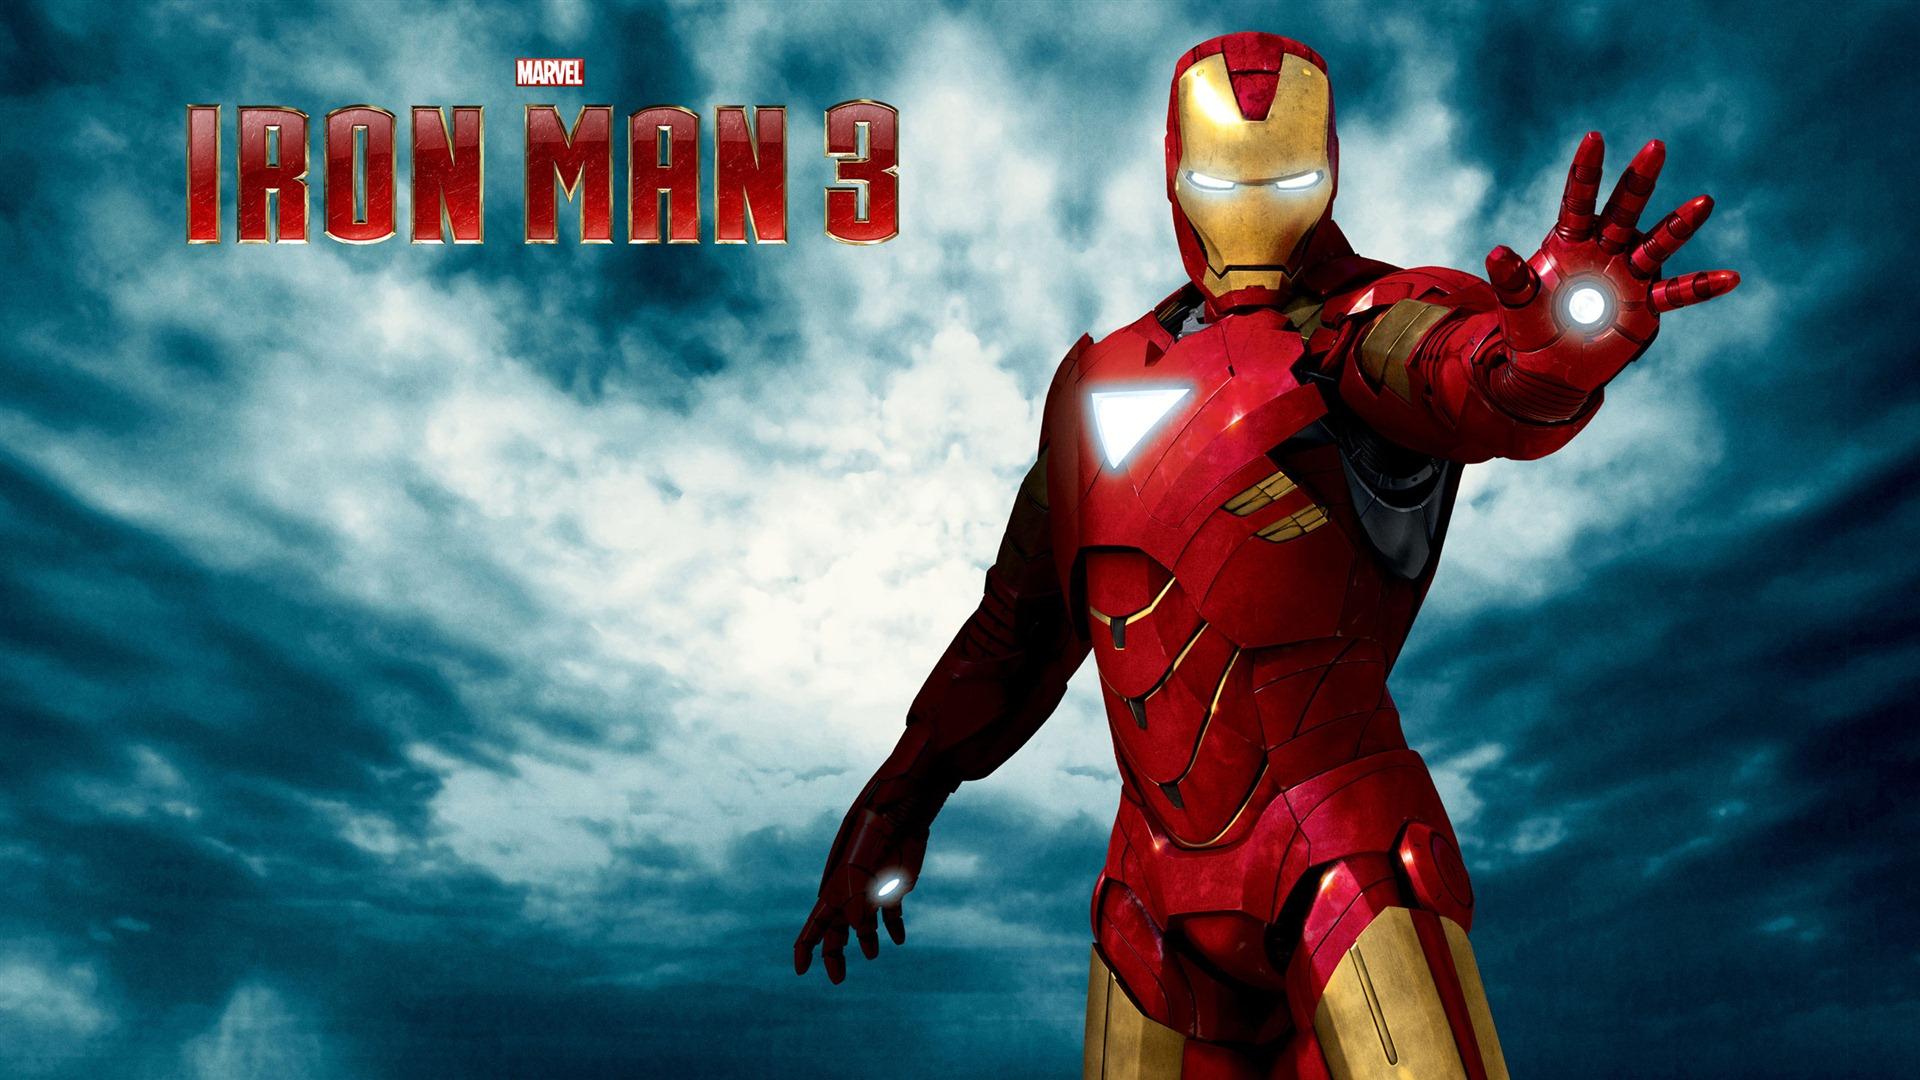 Iron Man 3 Hd Wallpapers 3 1920x1080 Wallpaper Download Iron